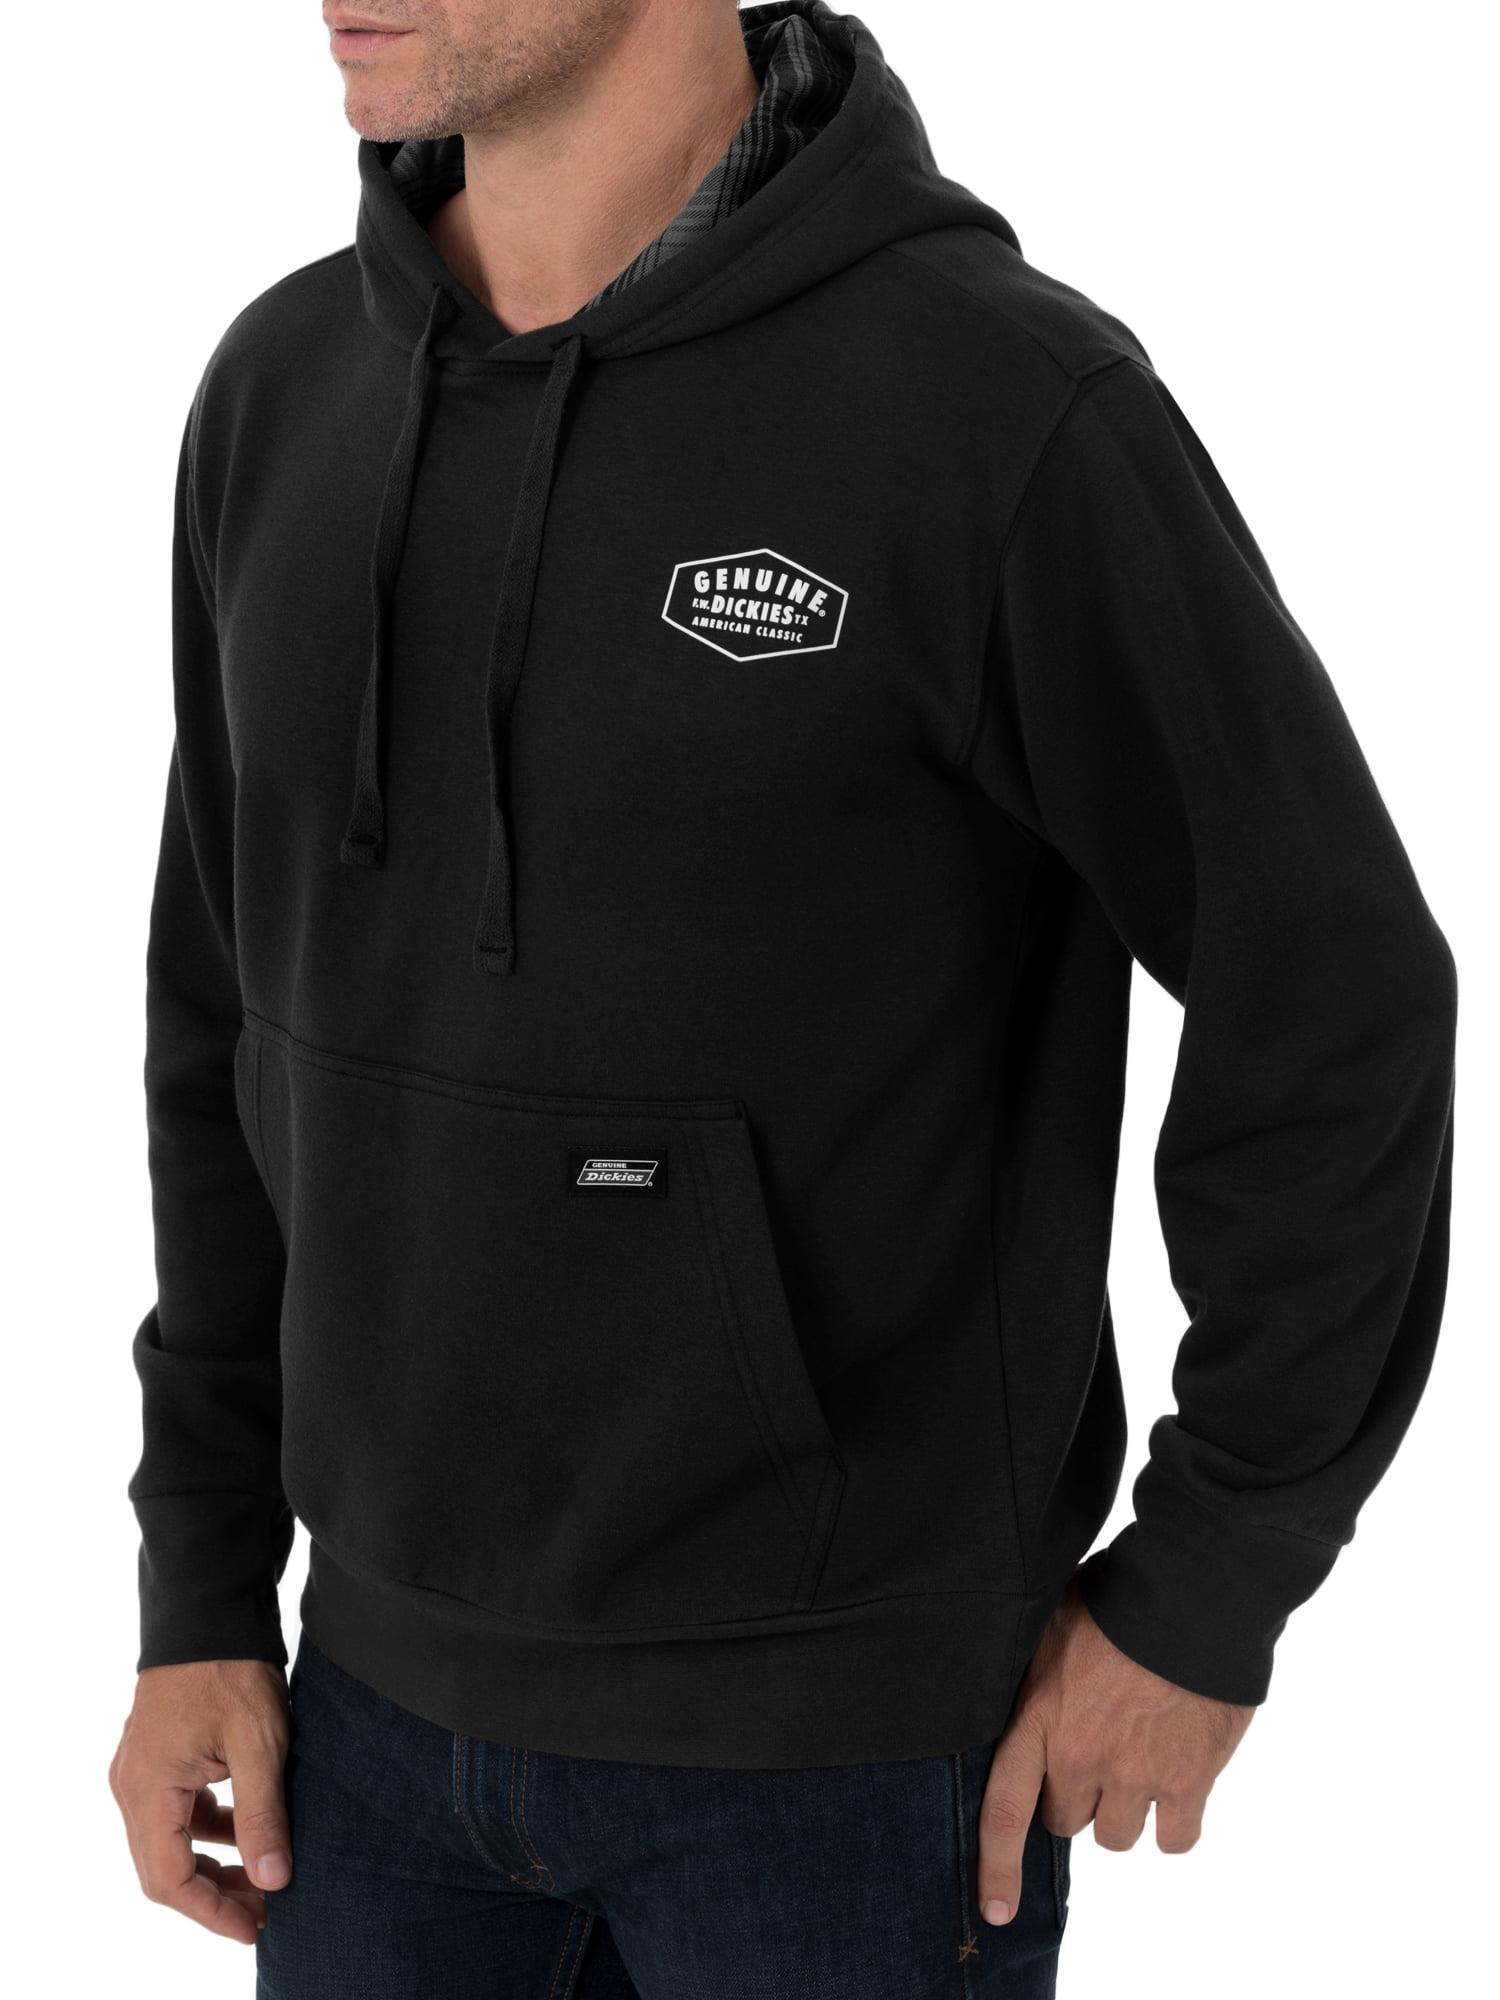 89d406f01 Dickies - Dickies Men s Fleece Pullover with Flannel Lined Hoodie ...